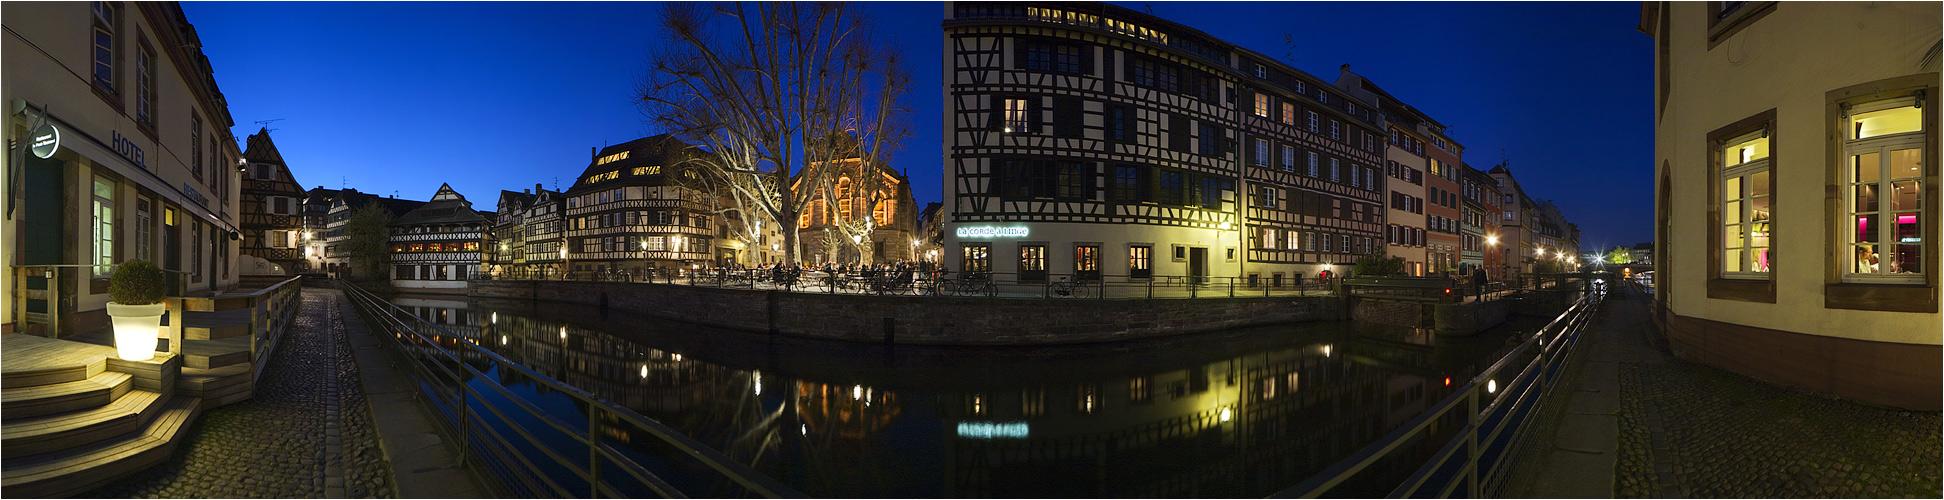 Strasbourg 1004 02